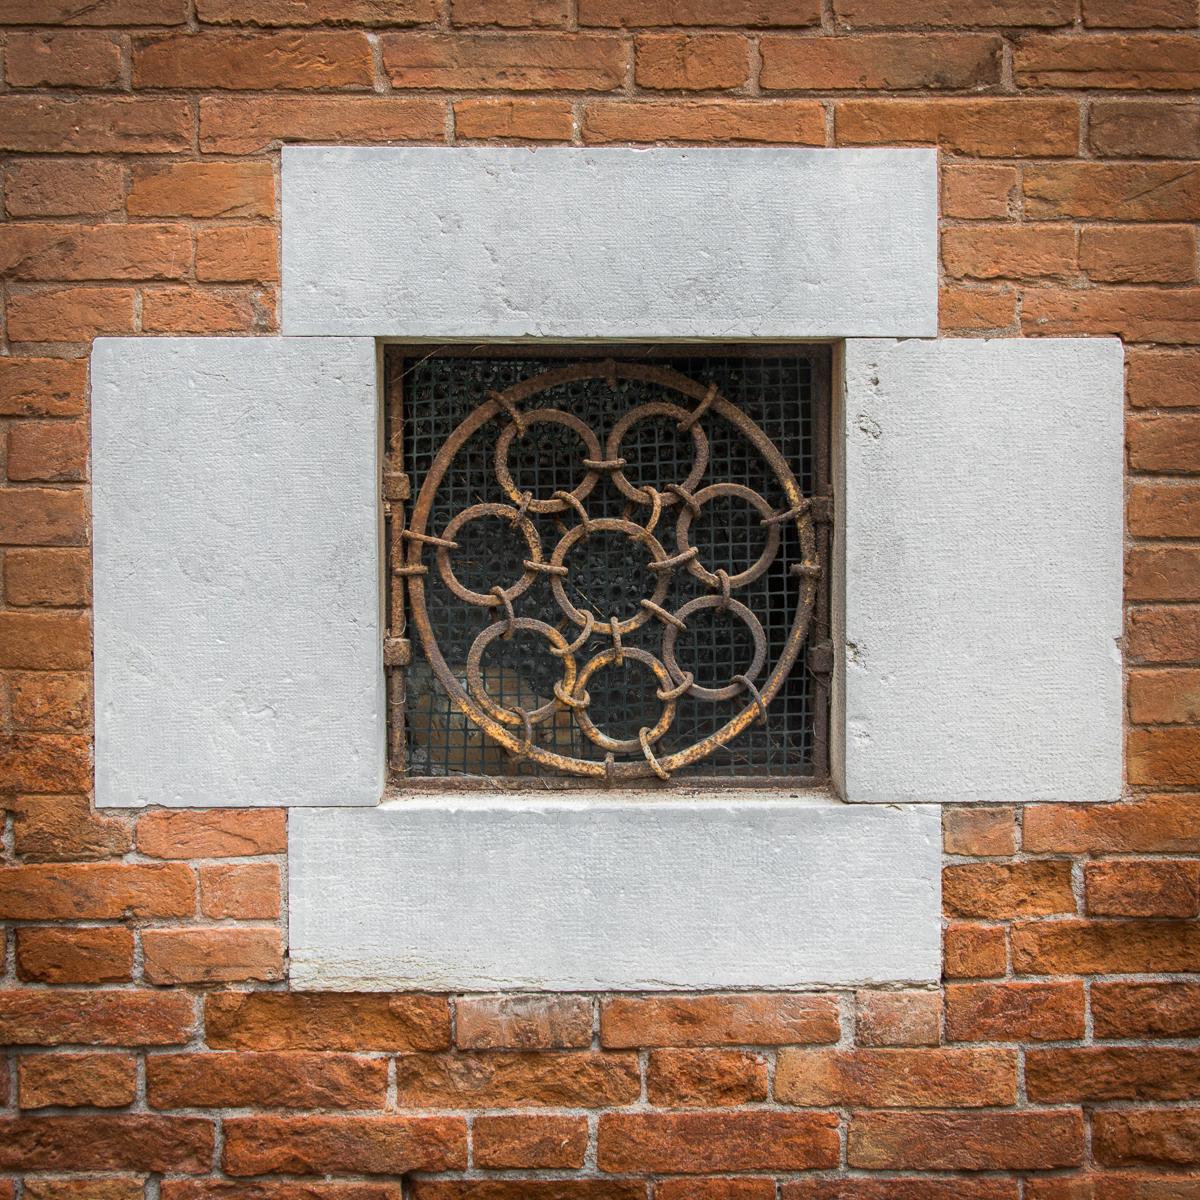 Simple stone window surround